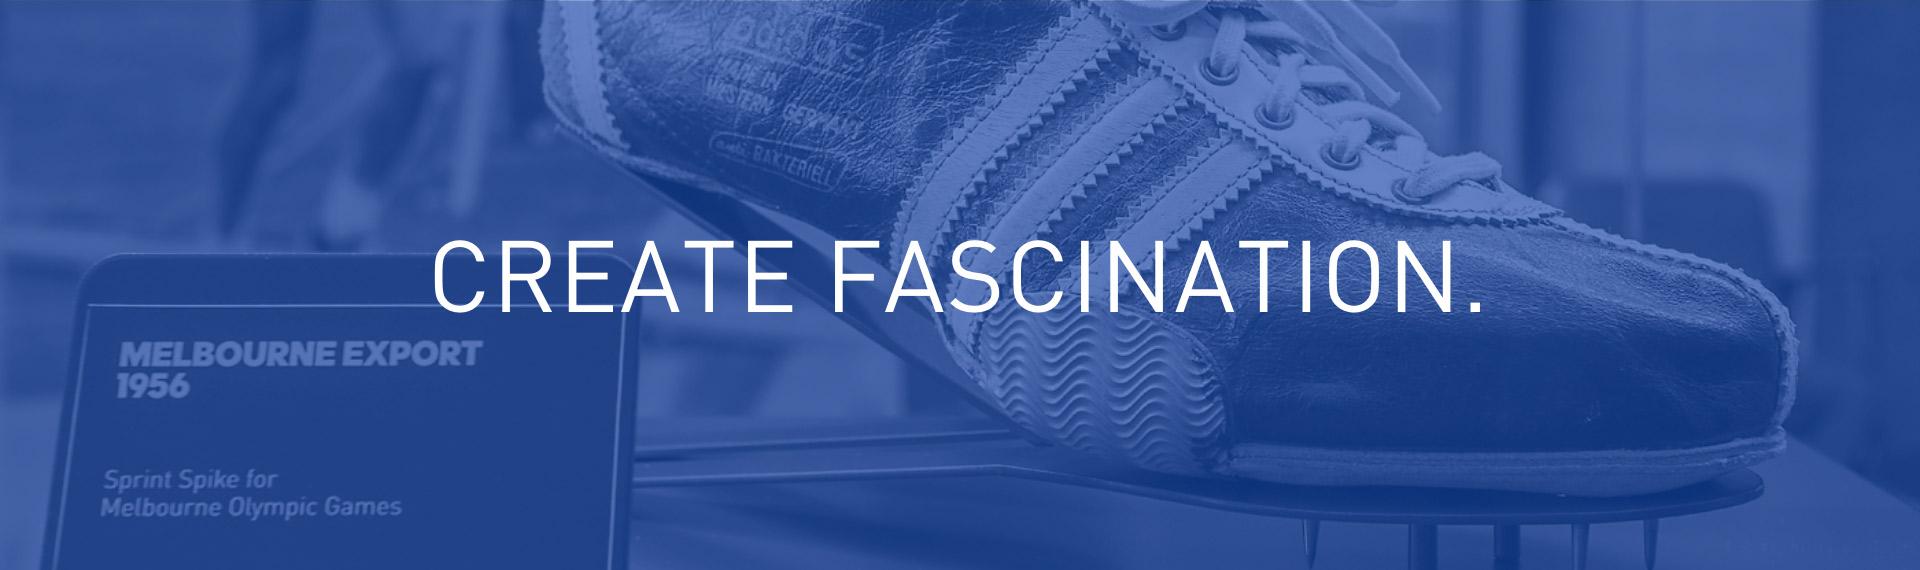 Create Fascination